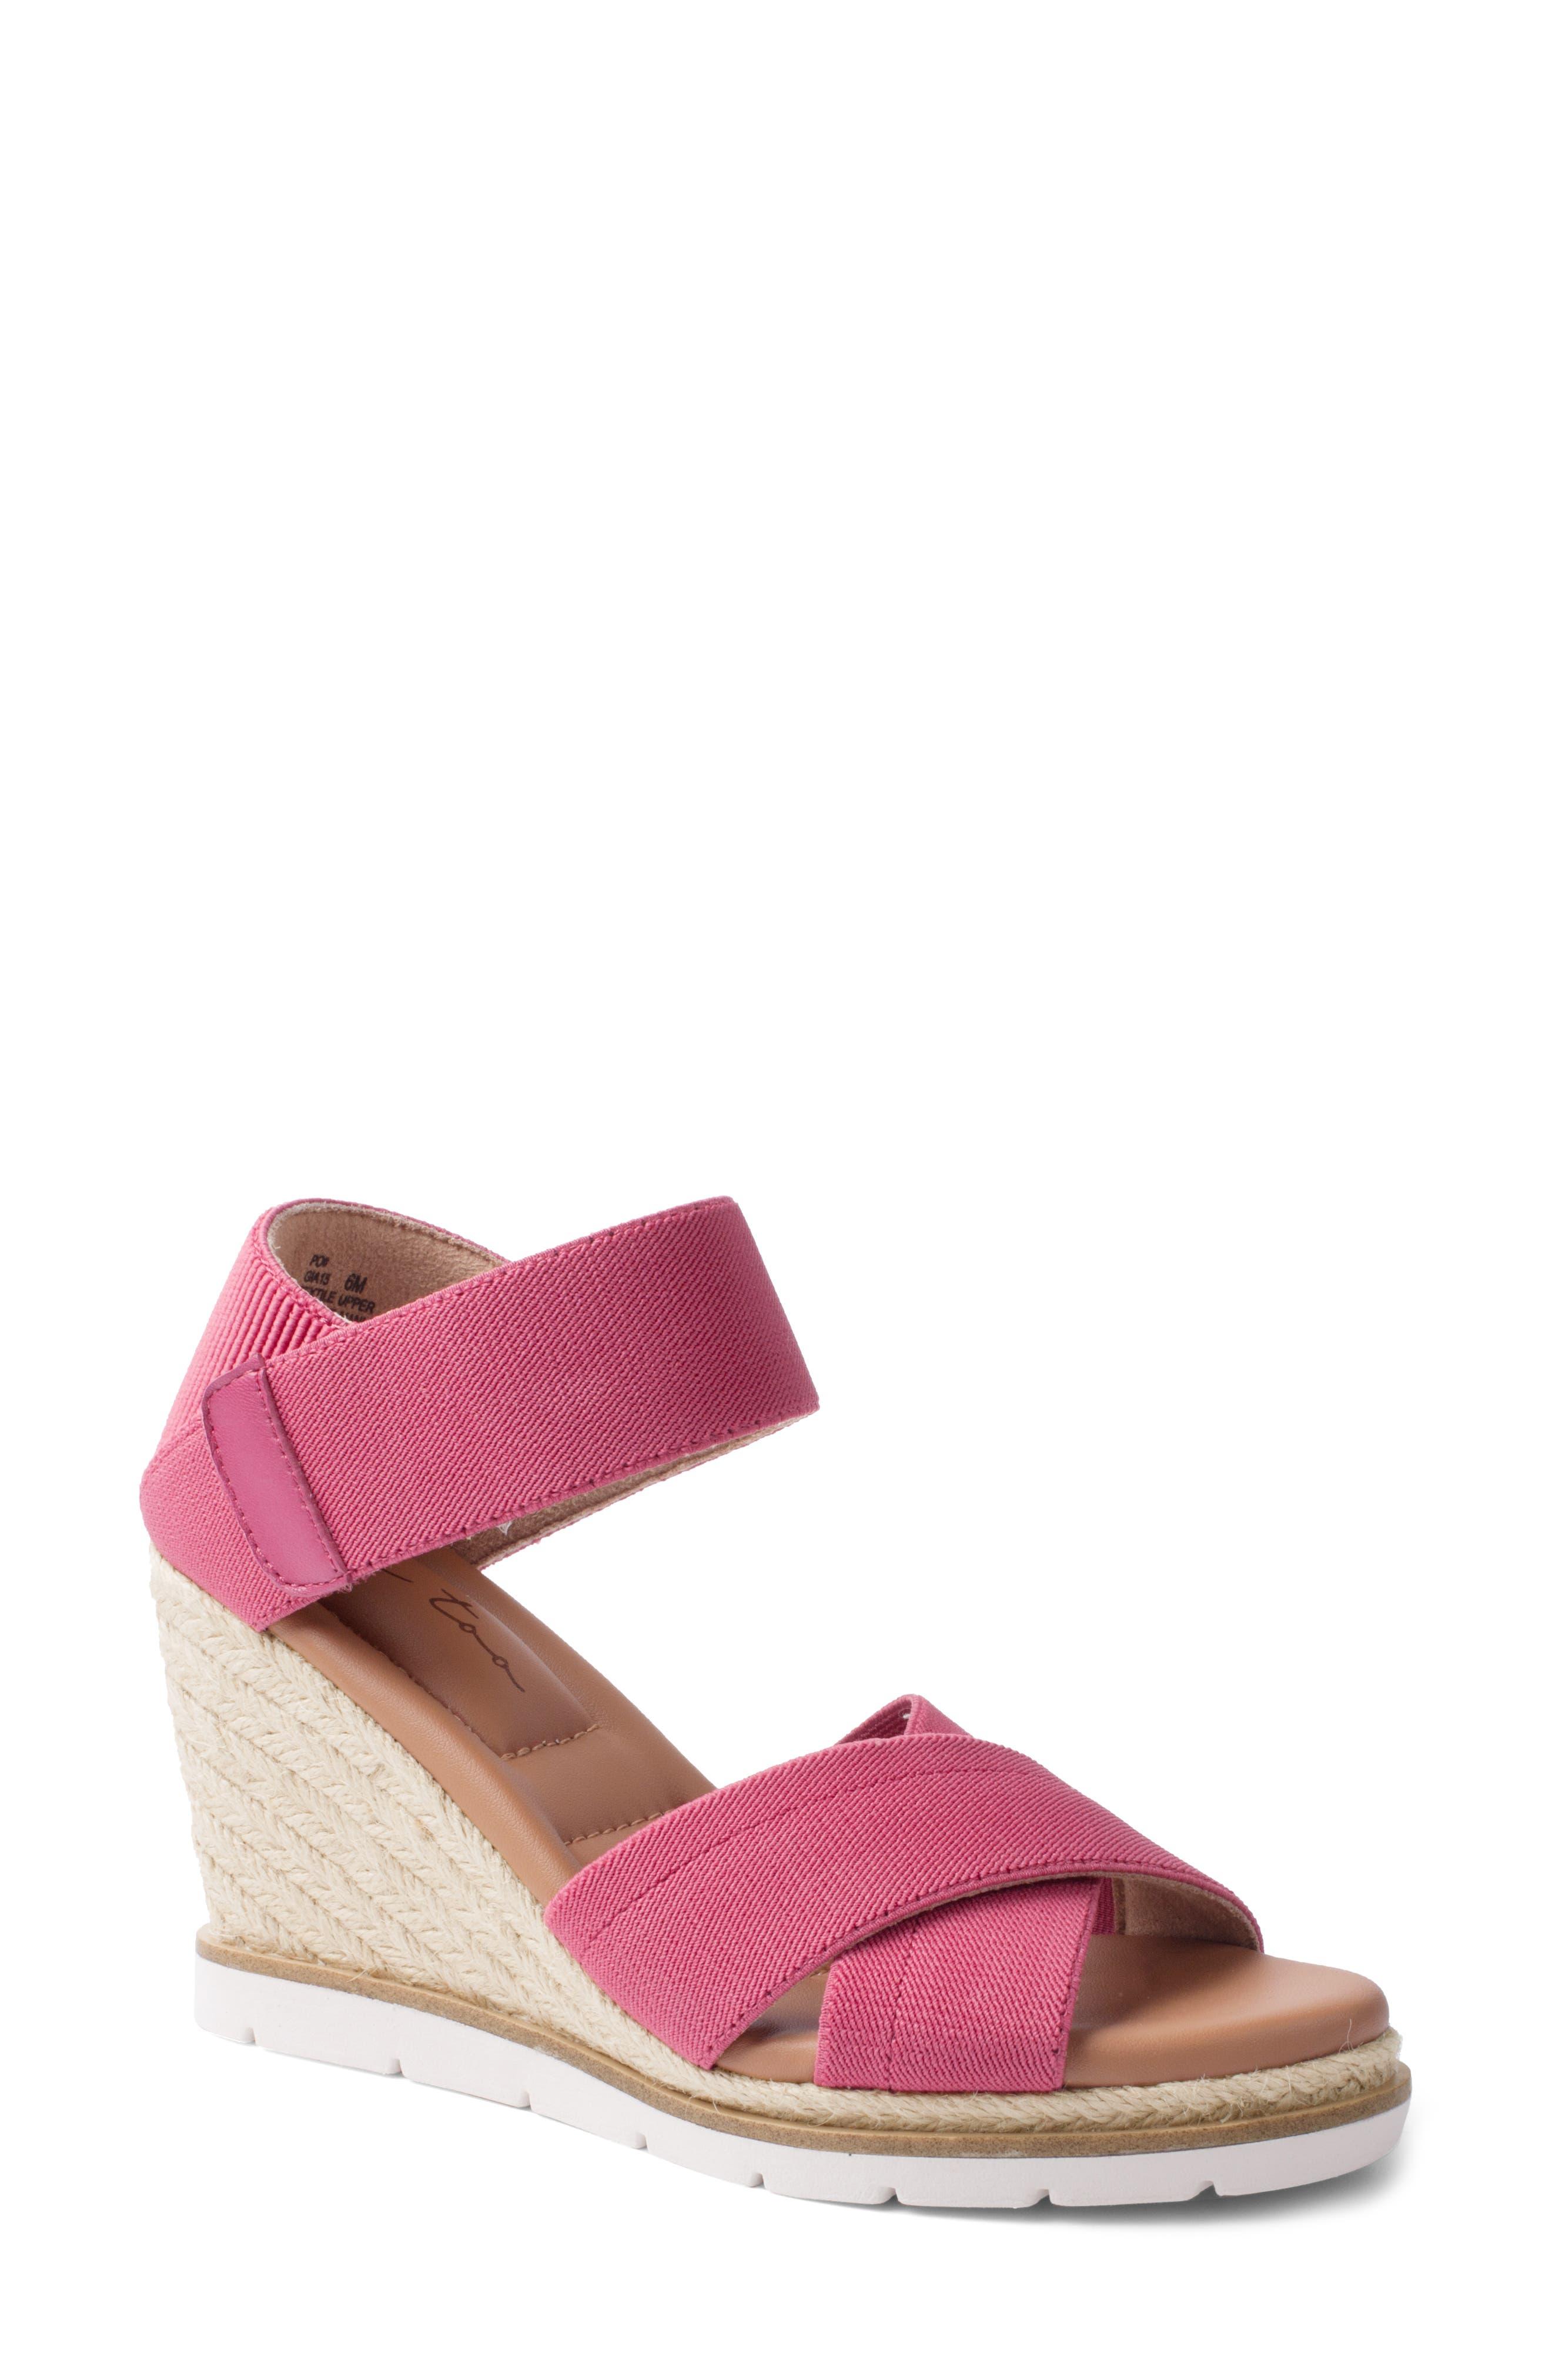 'Gia' Gladiator Sandal